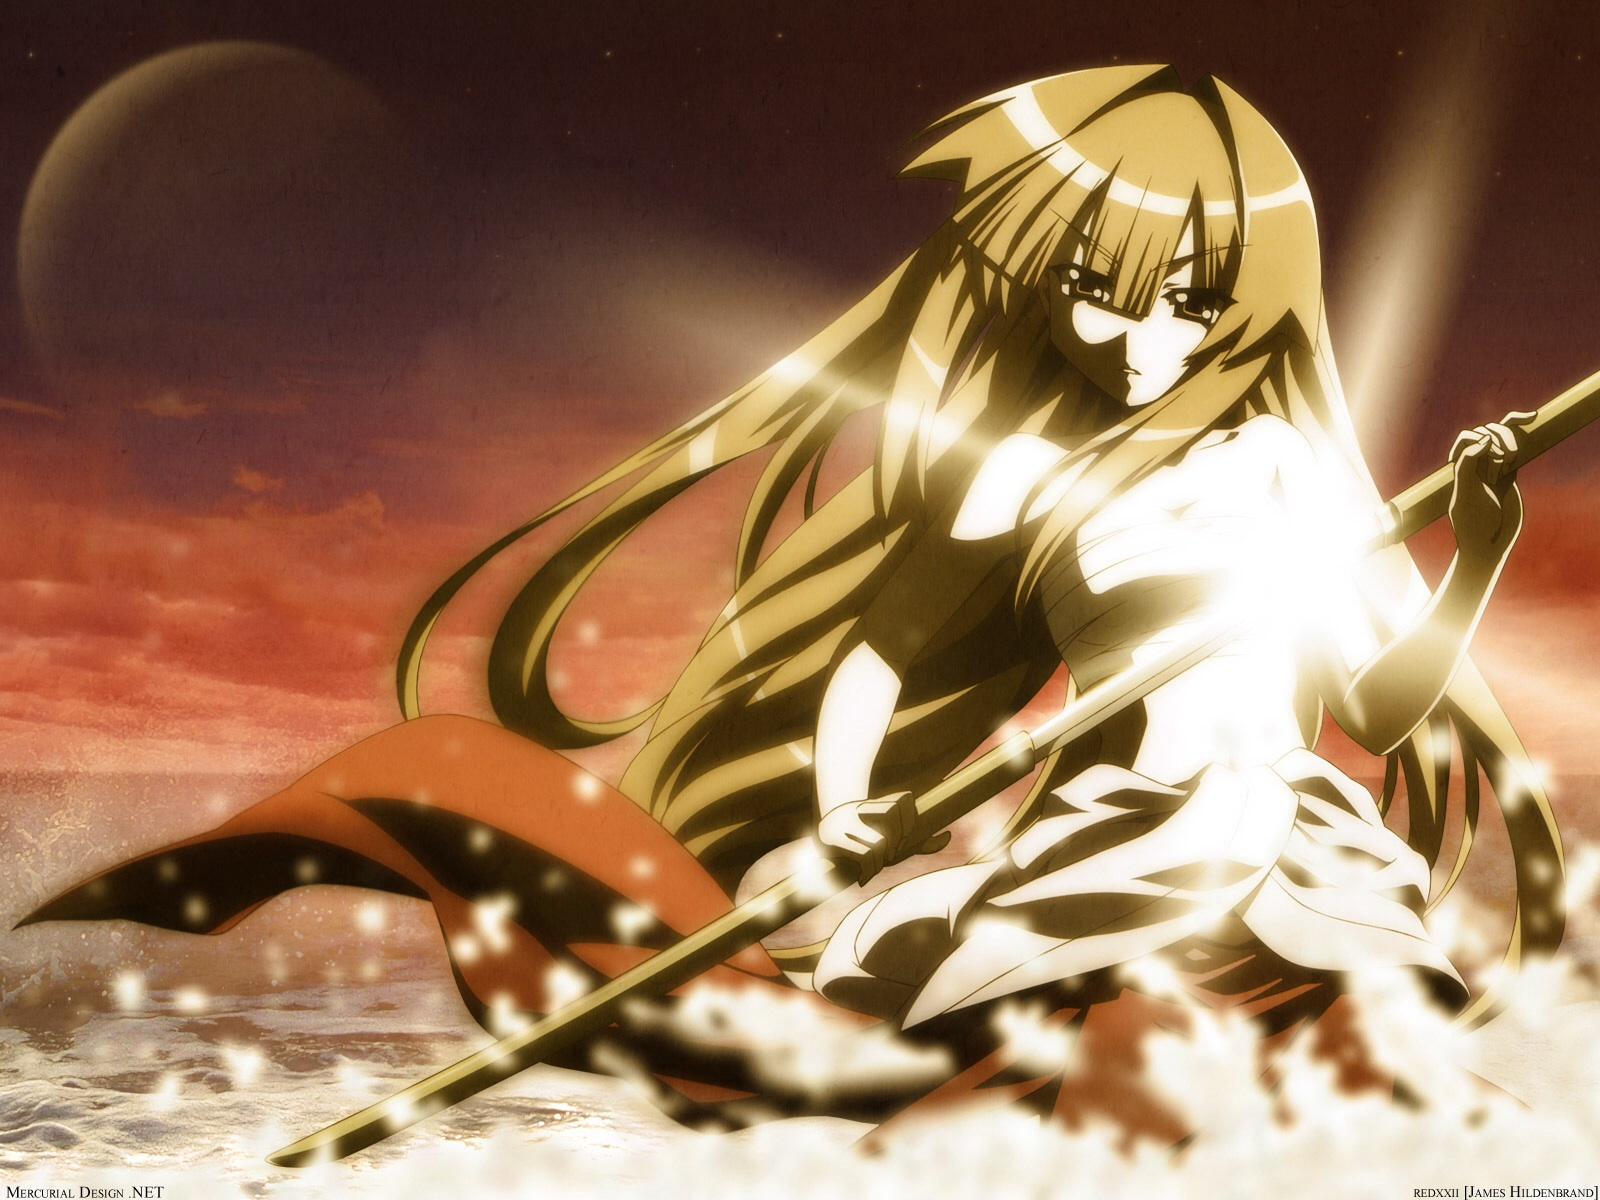 Sun Seto brandishing her sword